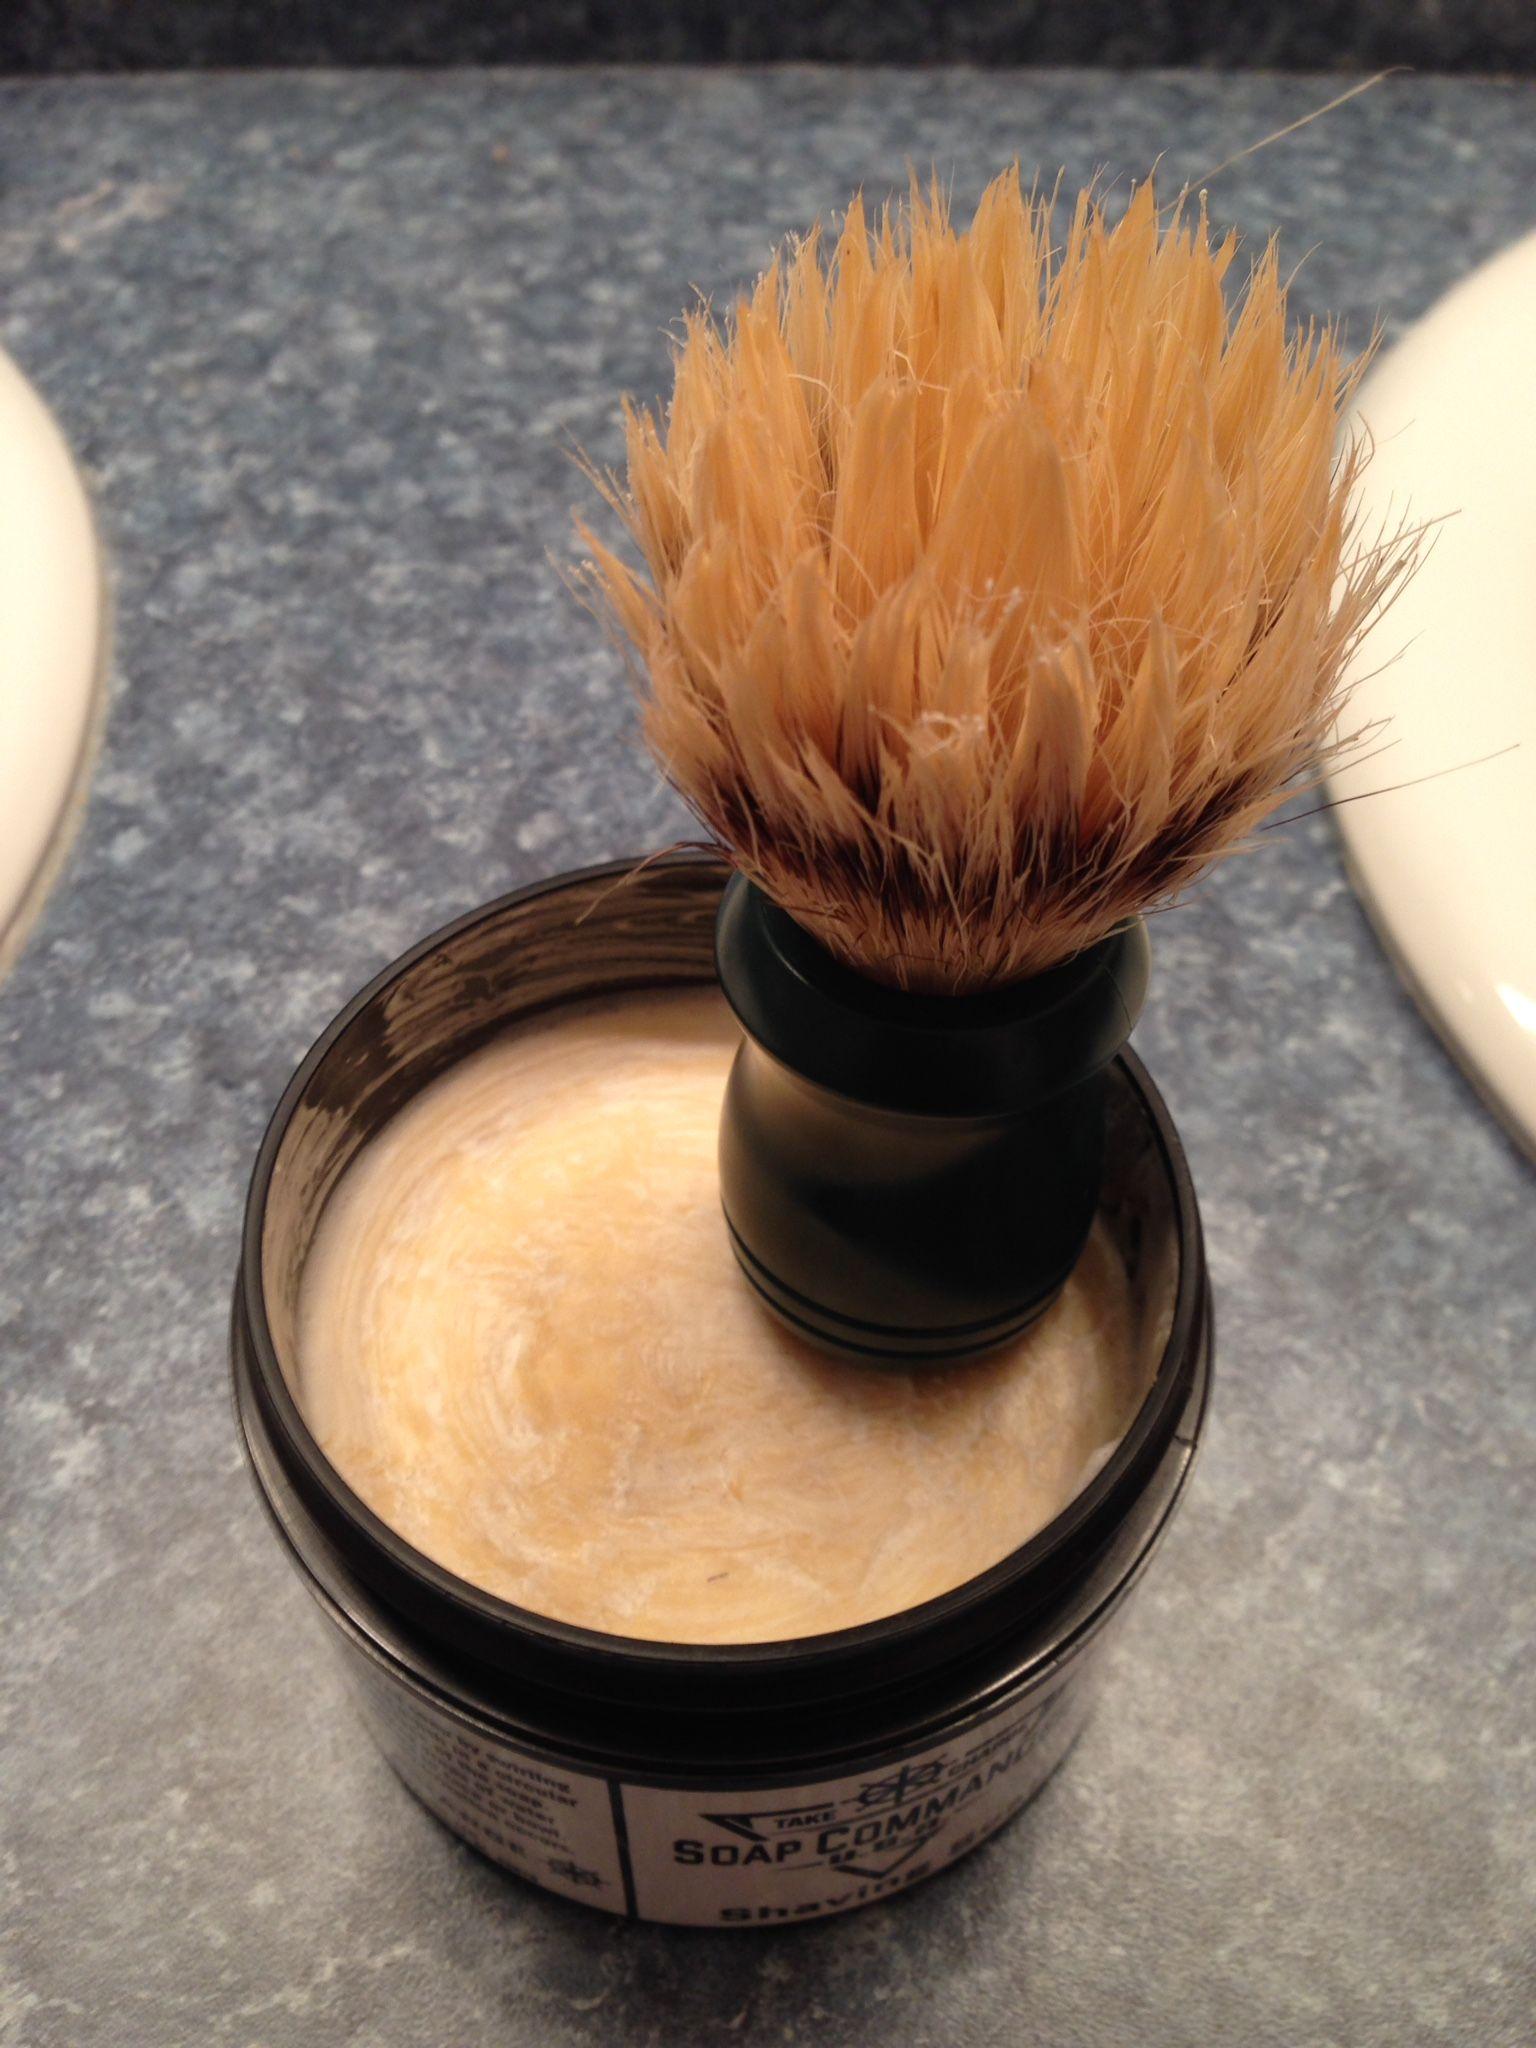 #BaldNation bowless shave  thebaldnation.com